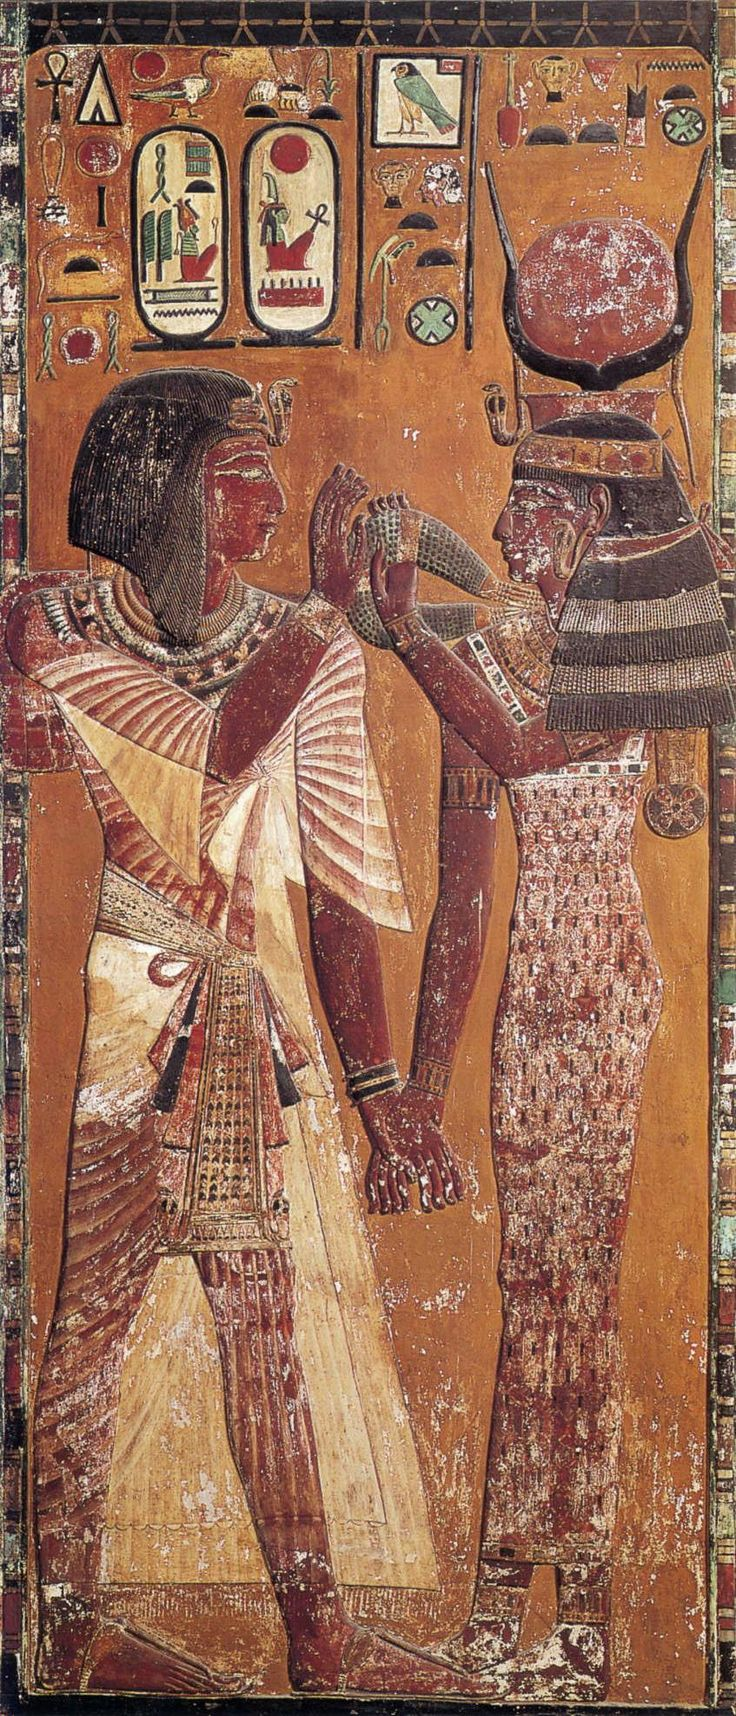 Pharaoh Seti I and Goddess Hathor (19th Dynasty)